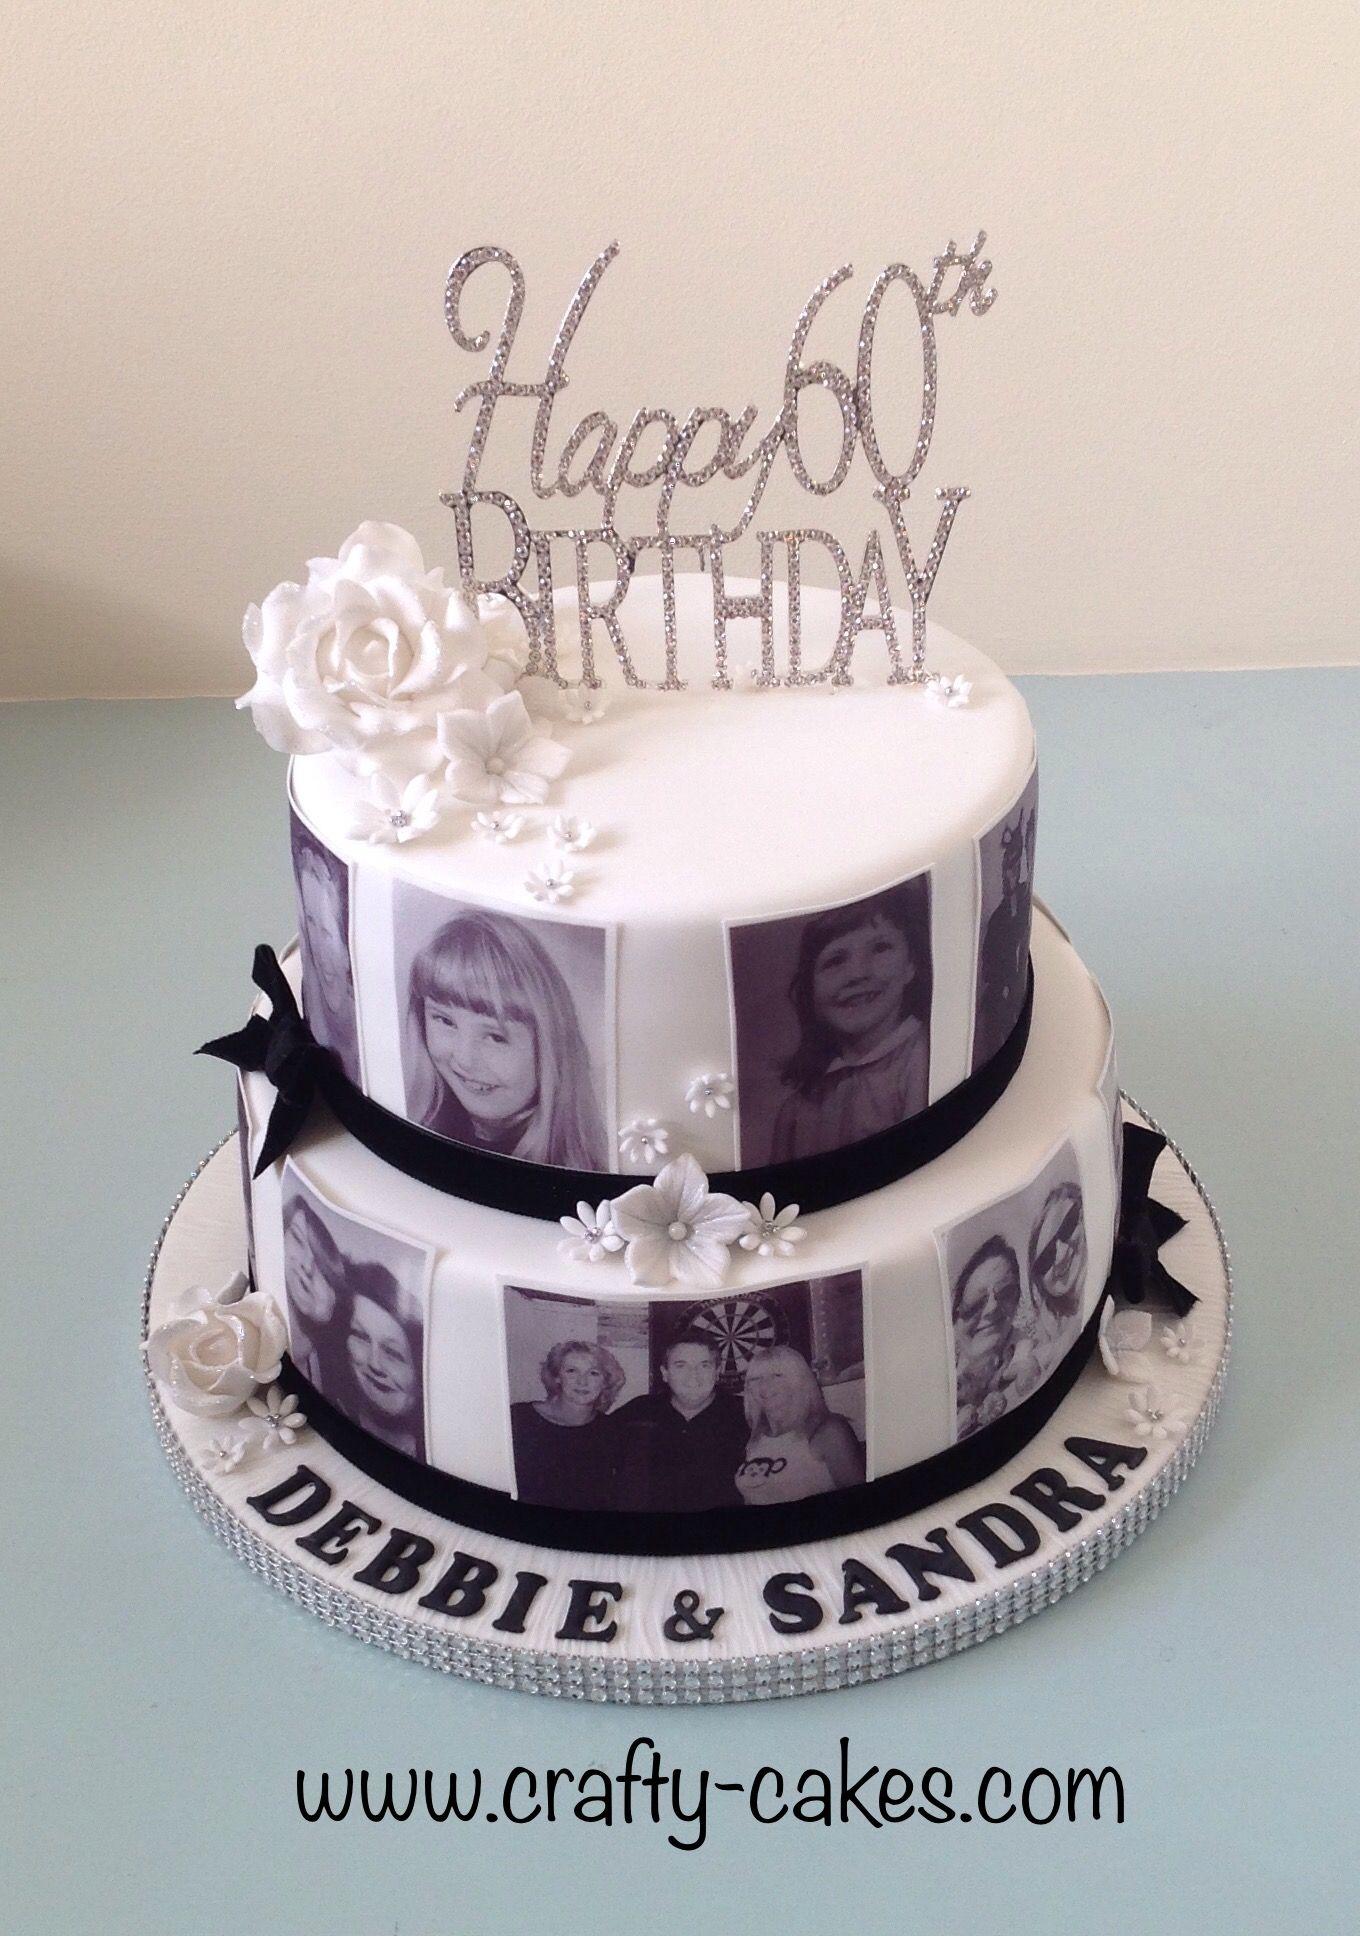 60th Birthday Cake With Edible Photos